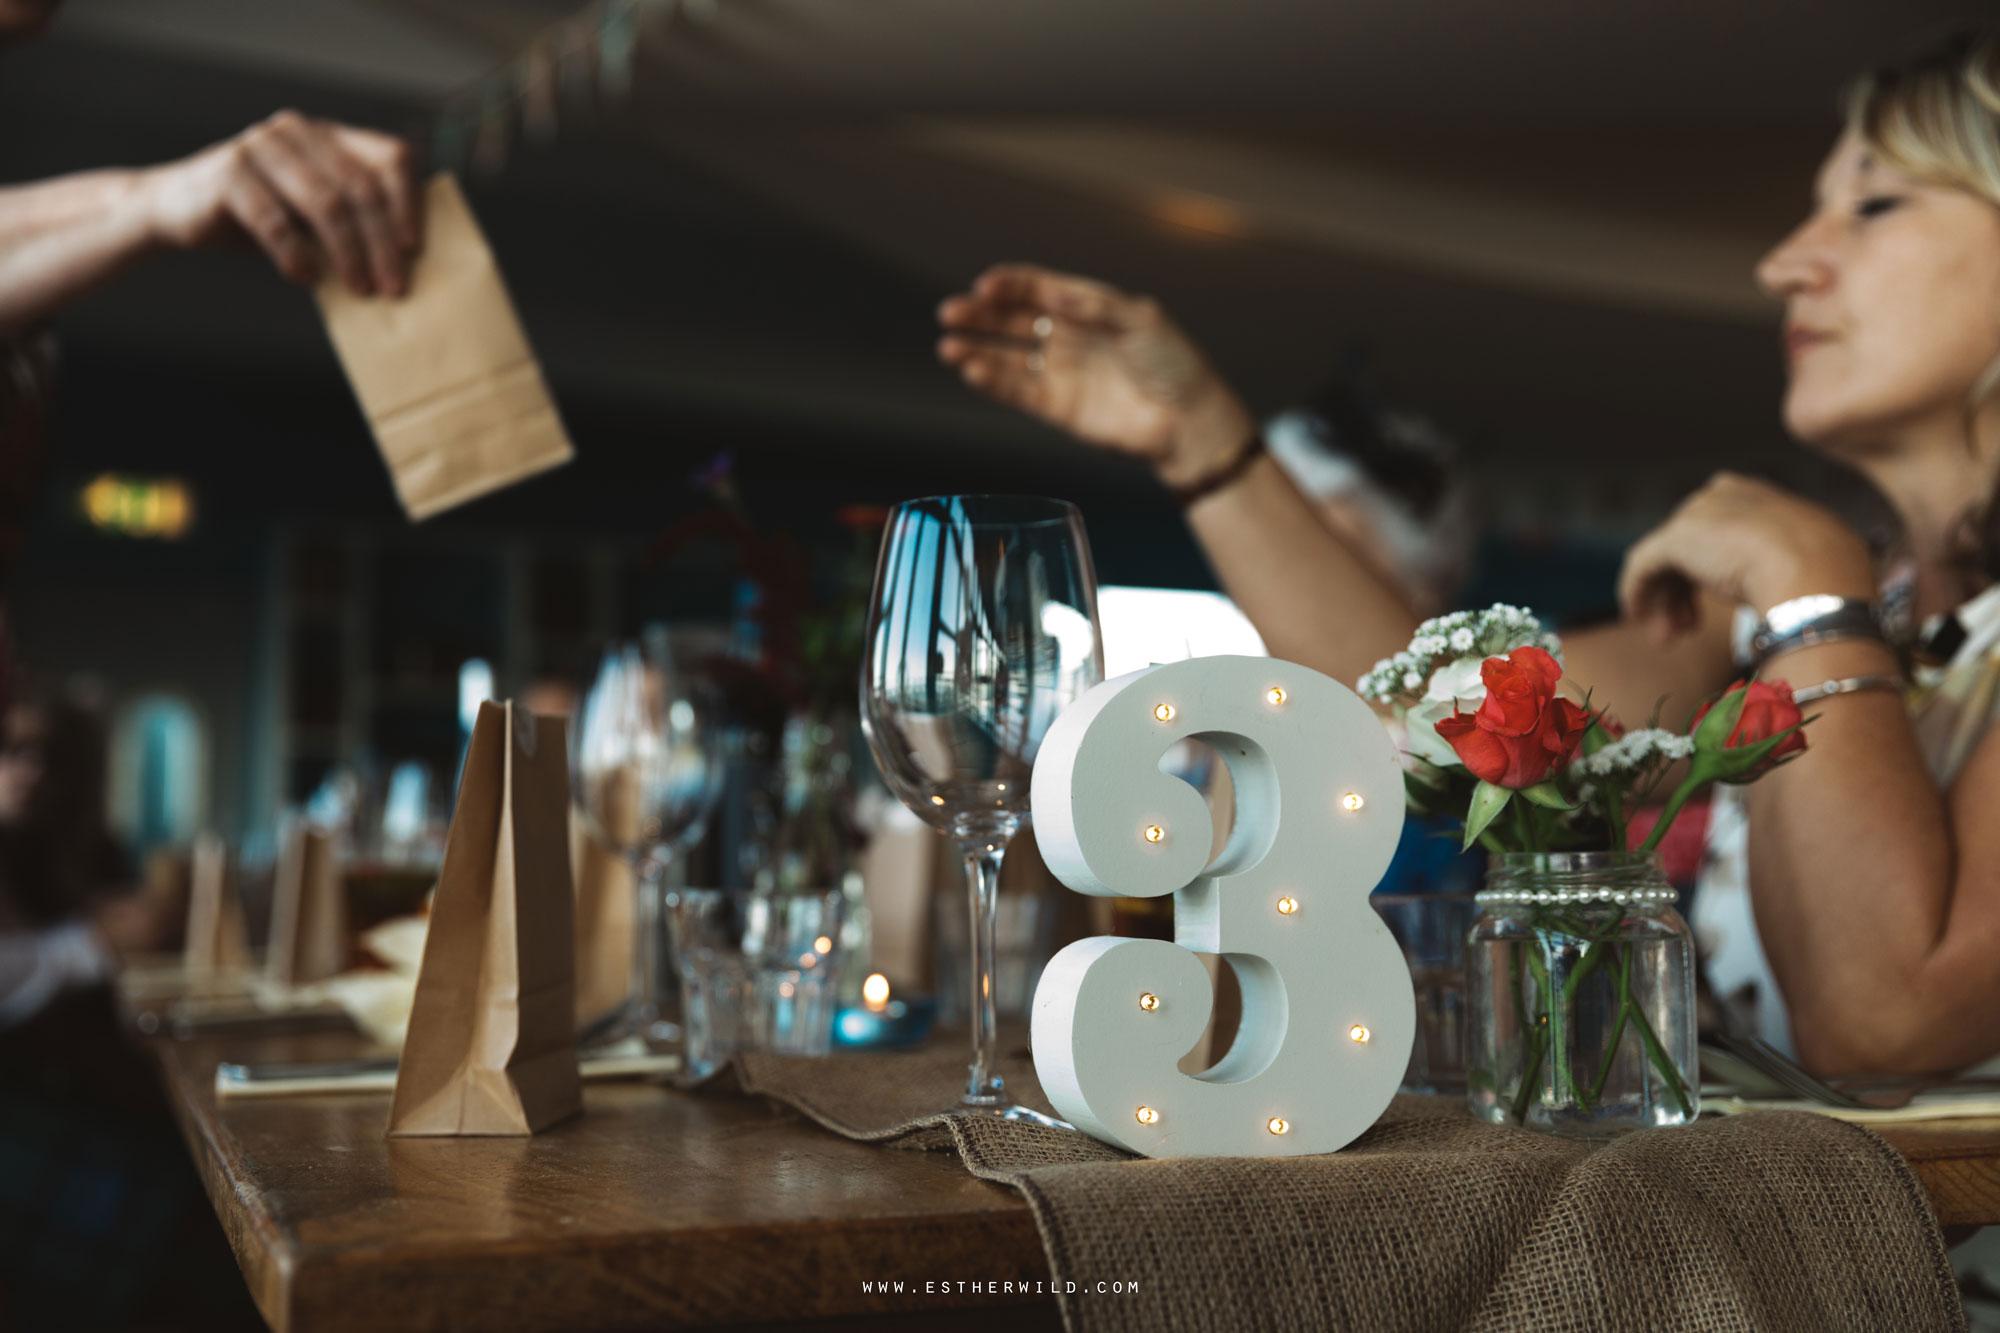 Cromer_Wedding_Beach_Outdoor_Ceremony_Norfolk_North_Lodge_Registry_Office_Rocket_House_Cafe_Cromer_Pier_IMG_4853.jpg